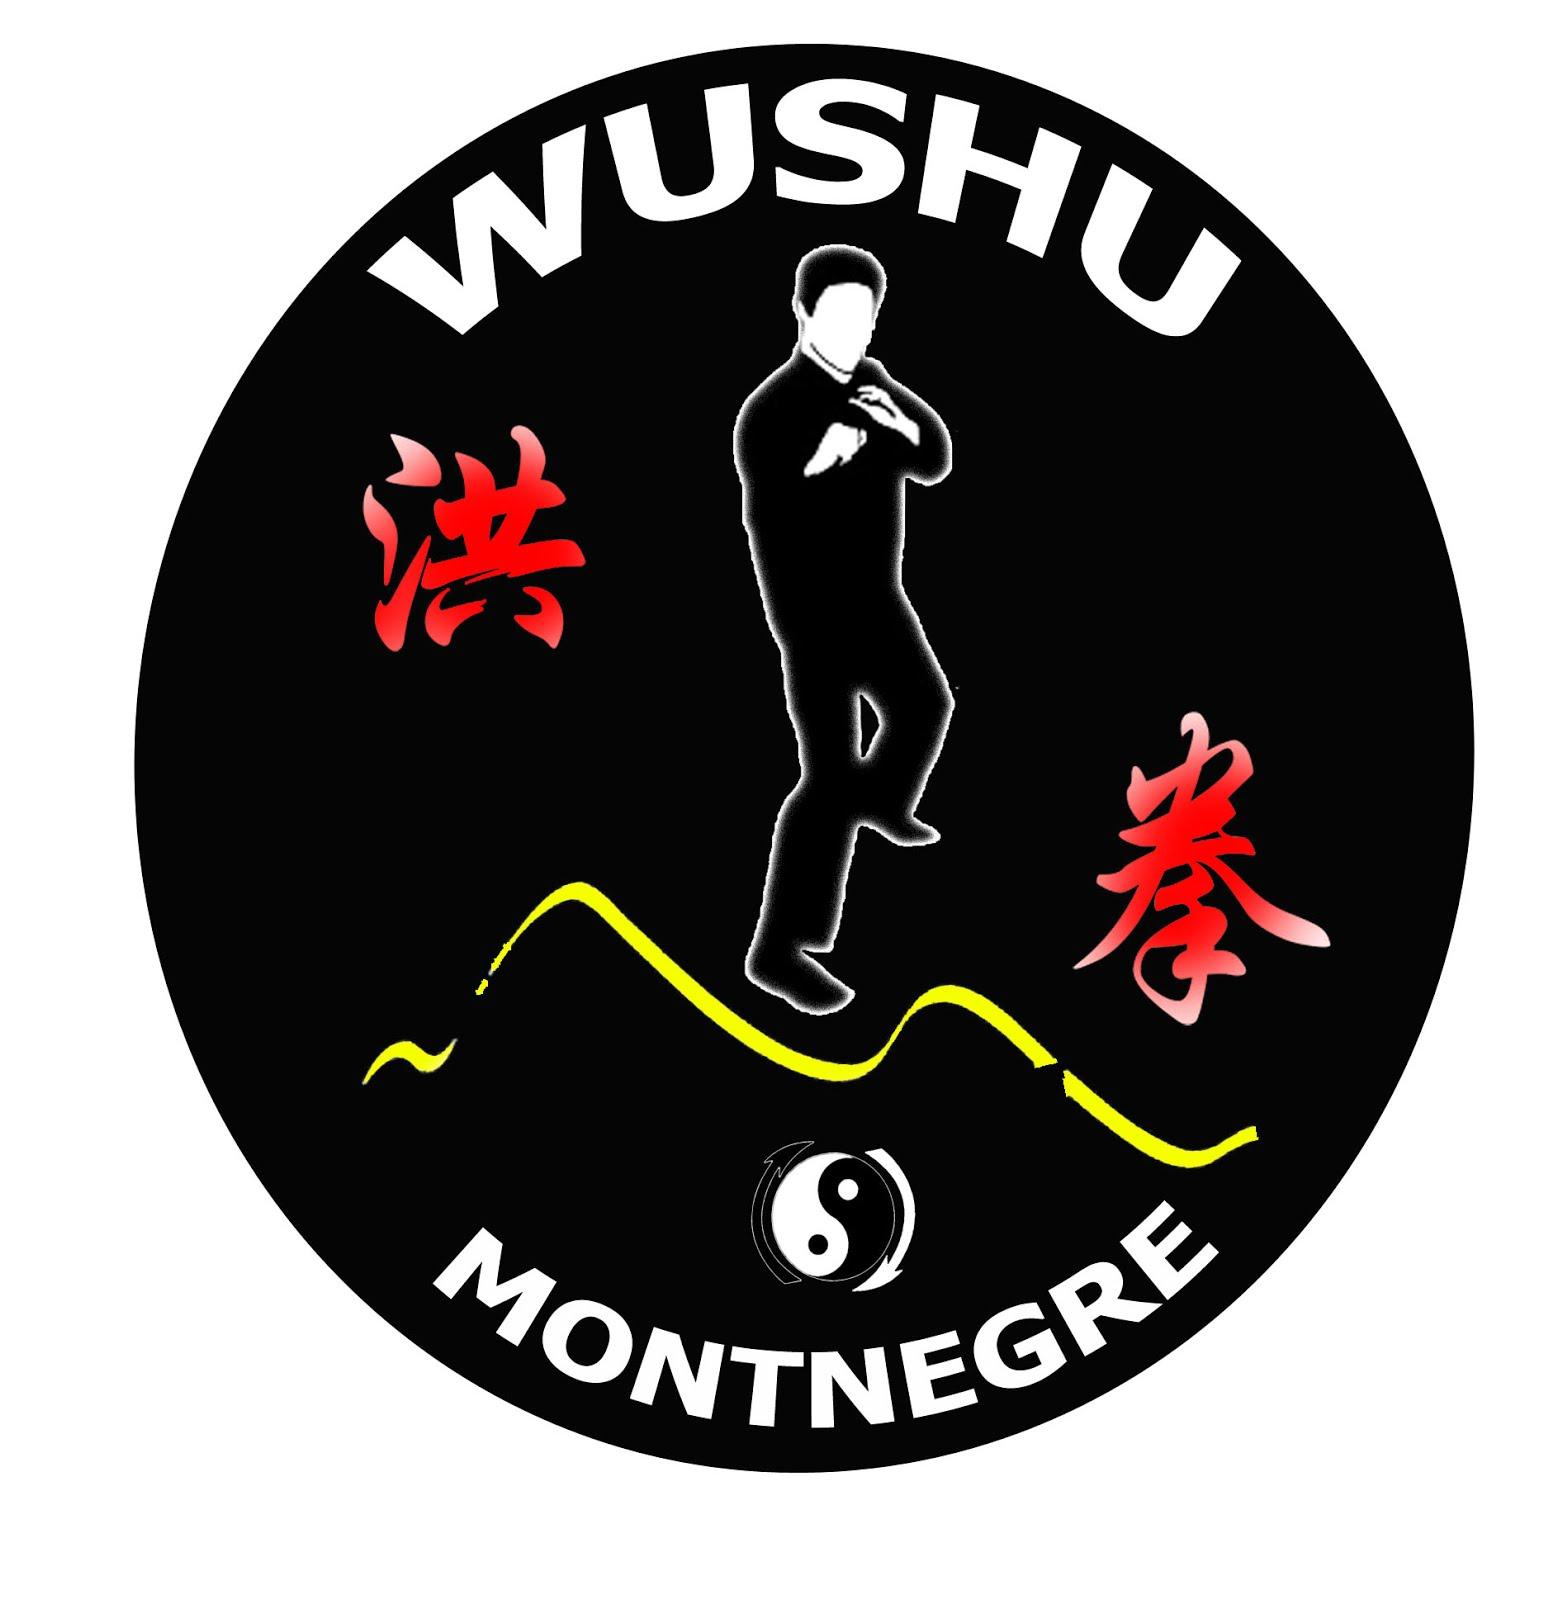 WUSHU MONTNEGRE